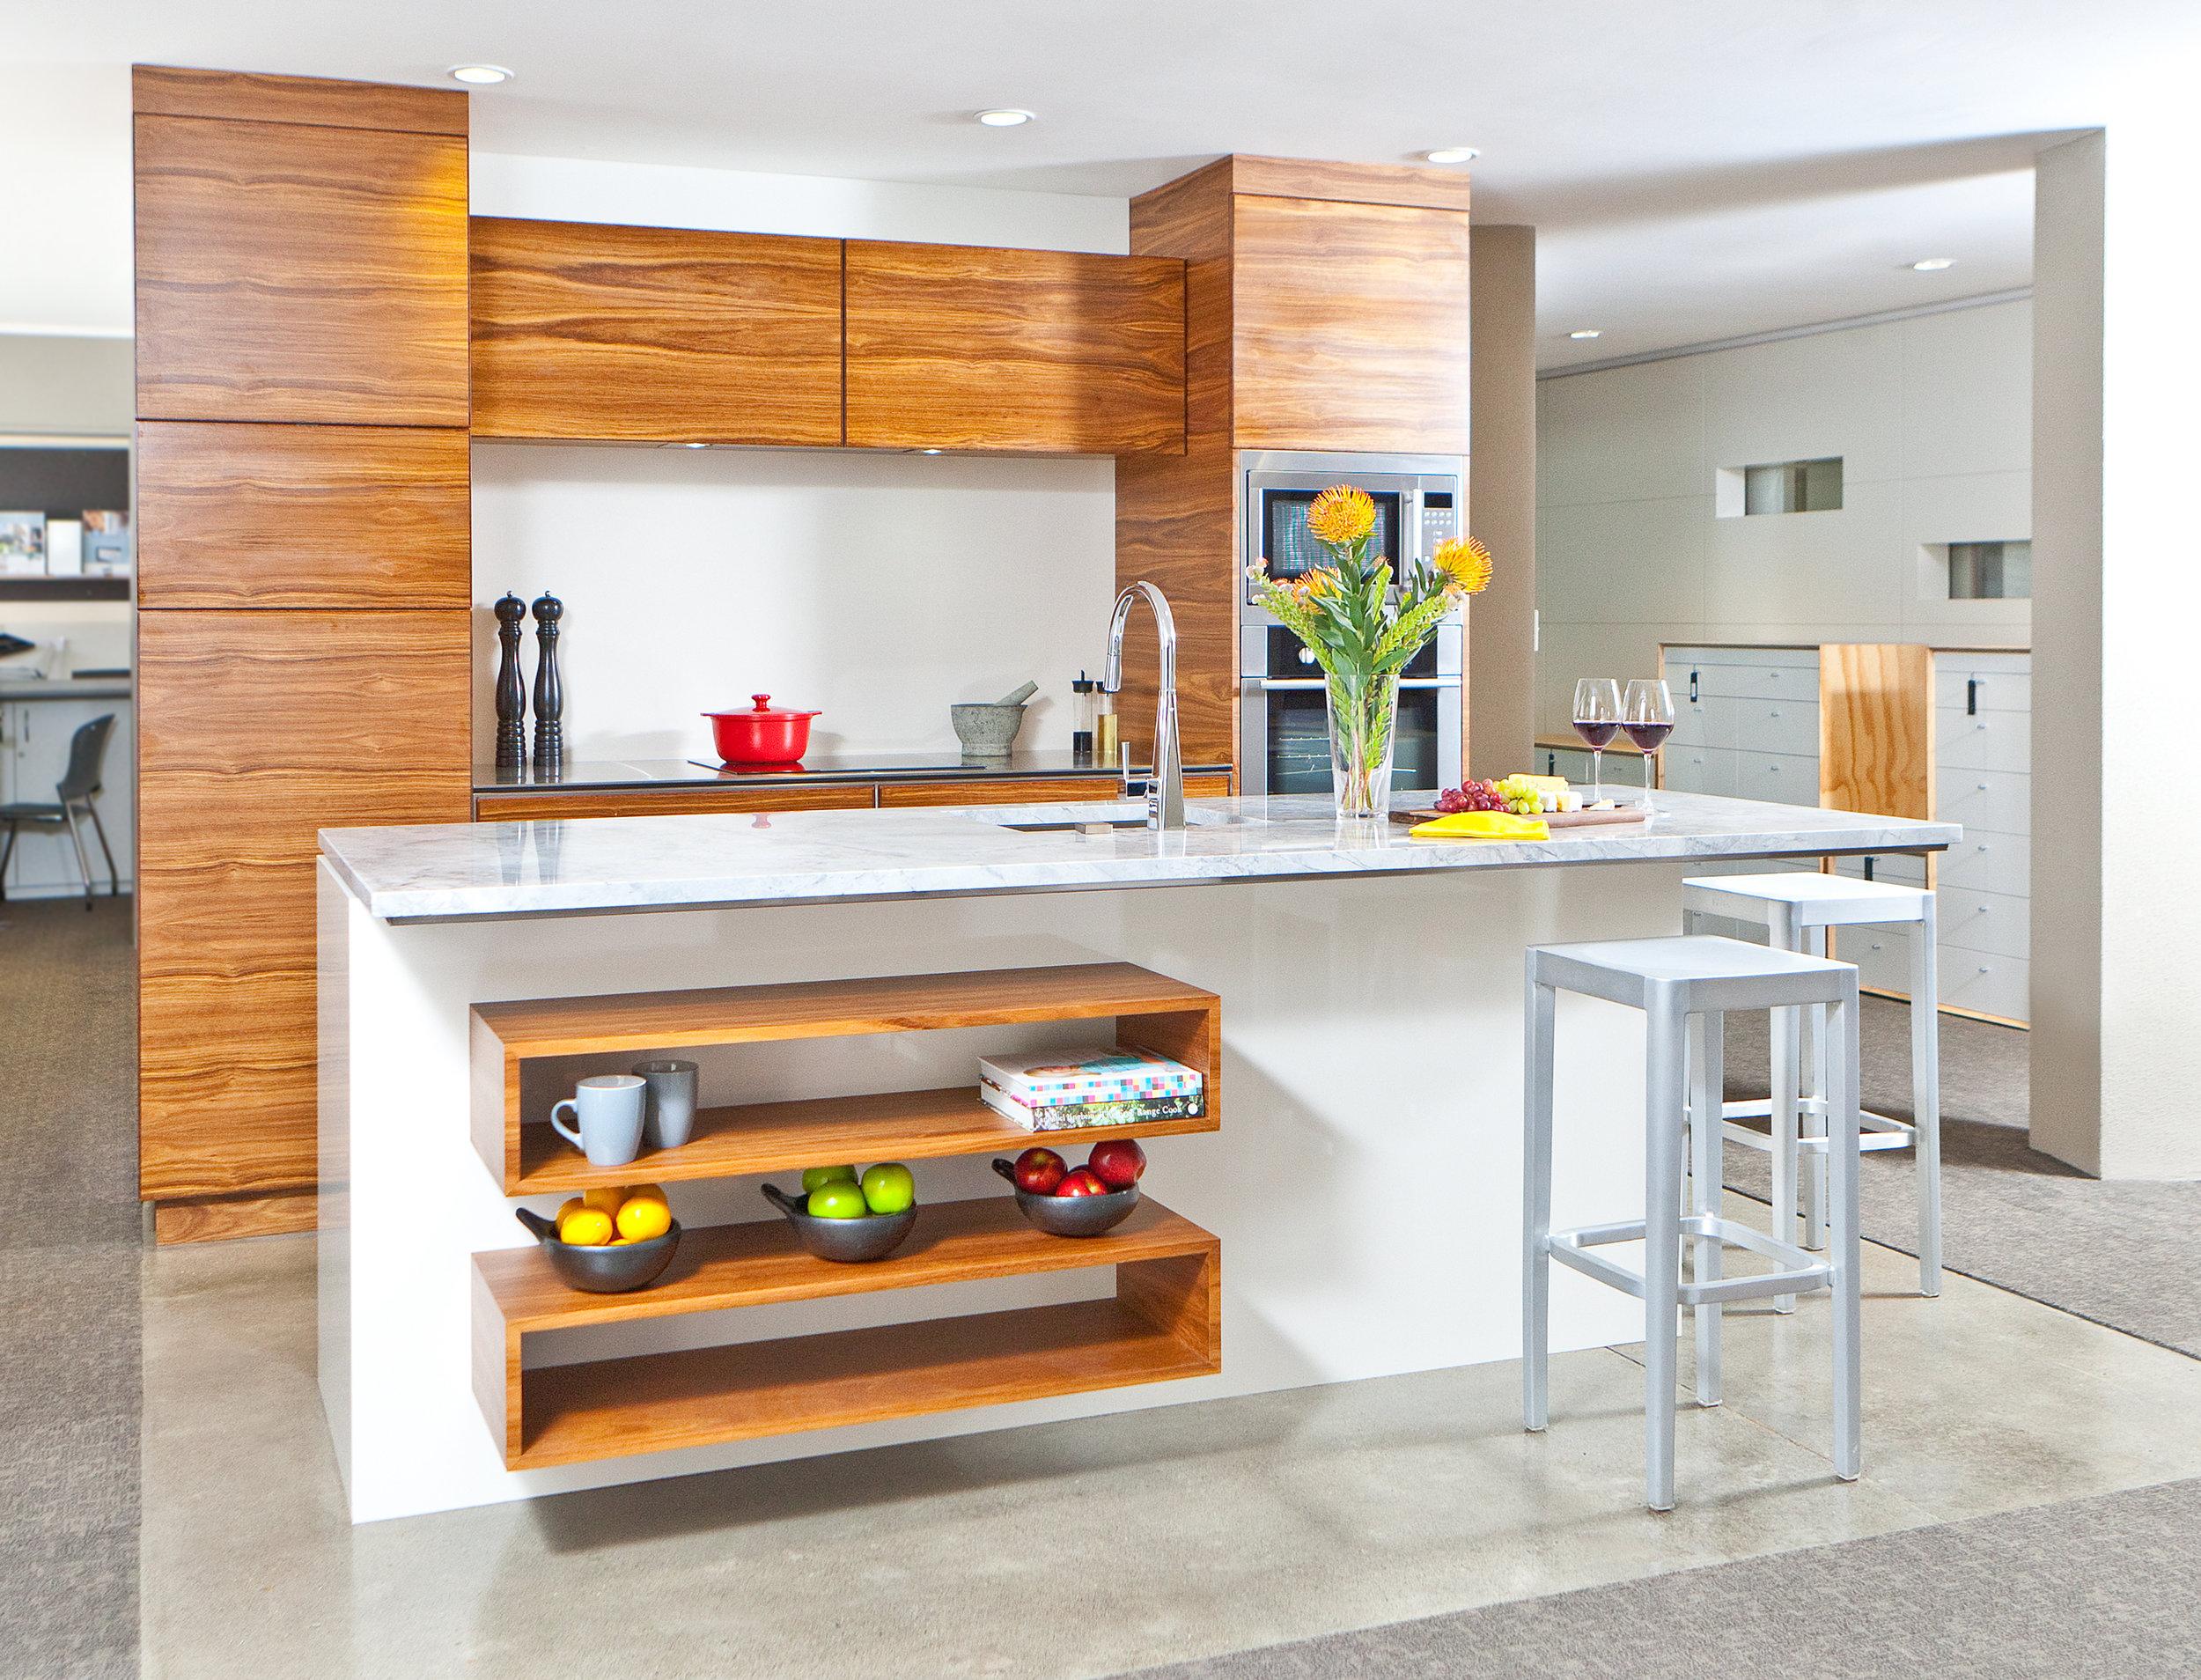 In Haus Design Imagery 98.jpg